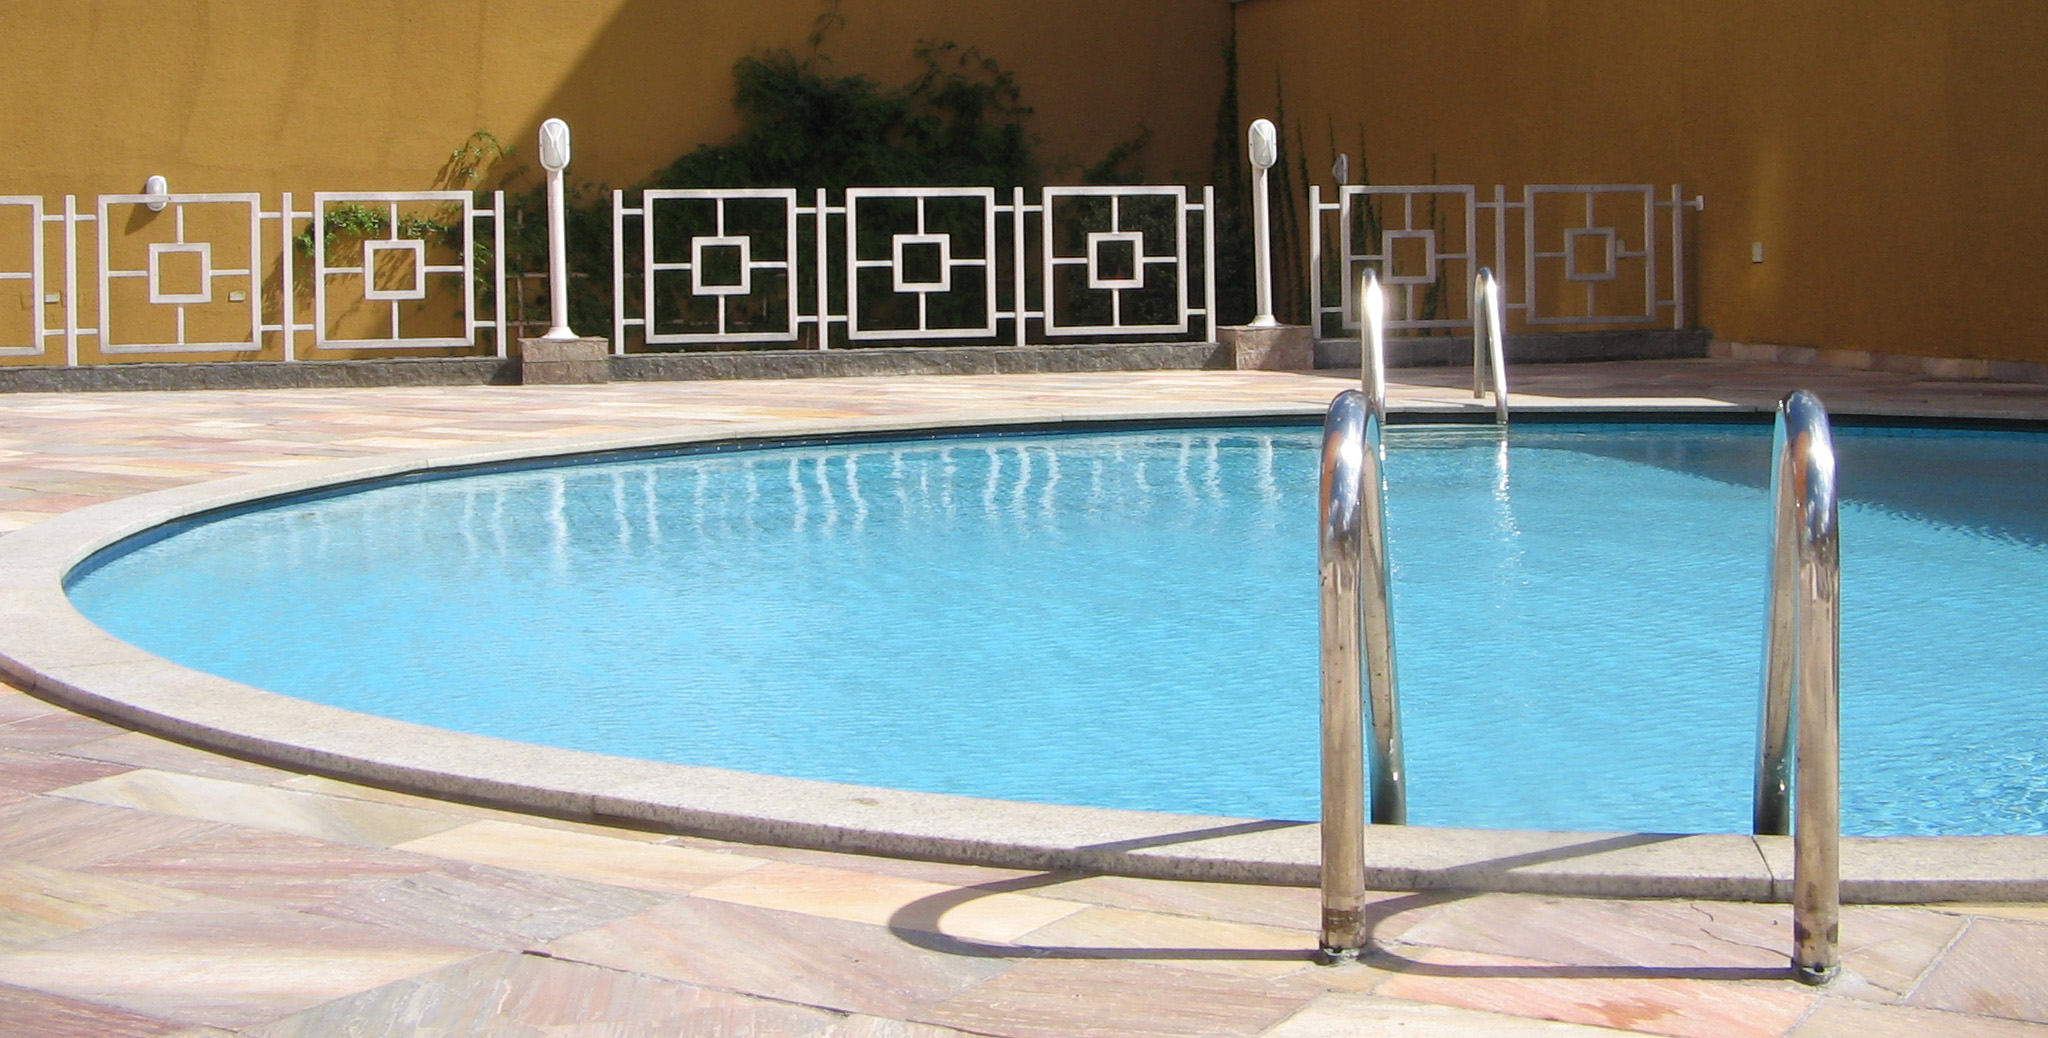 pool-blue-water-piscina-redonda-gua-azul-1623687